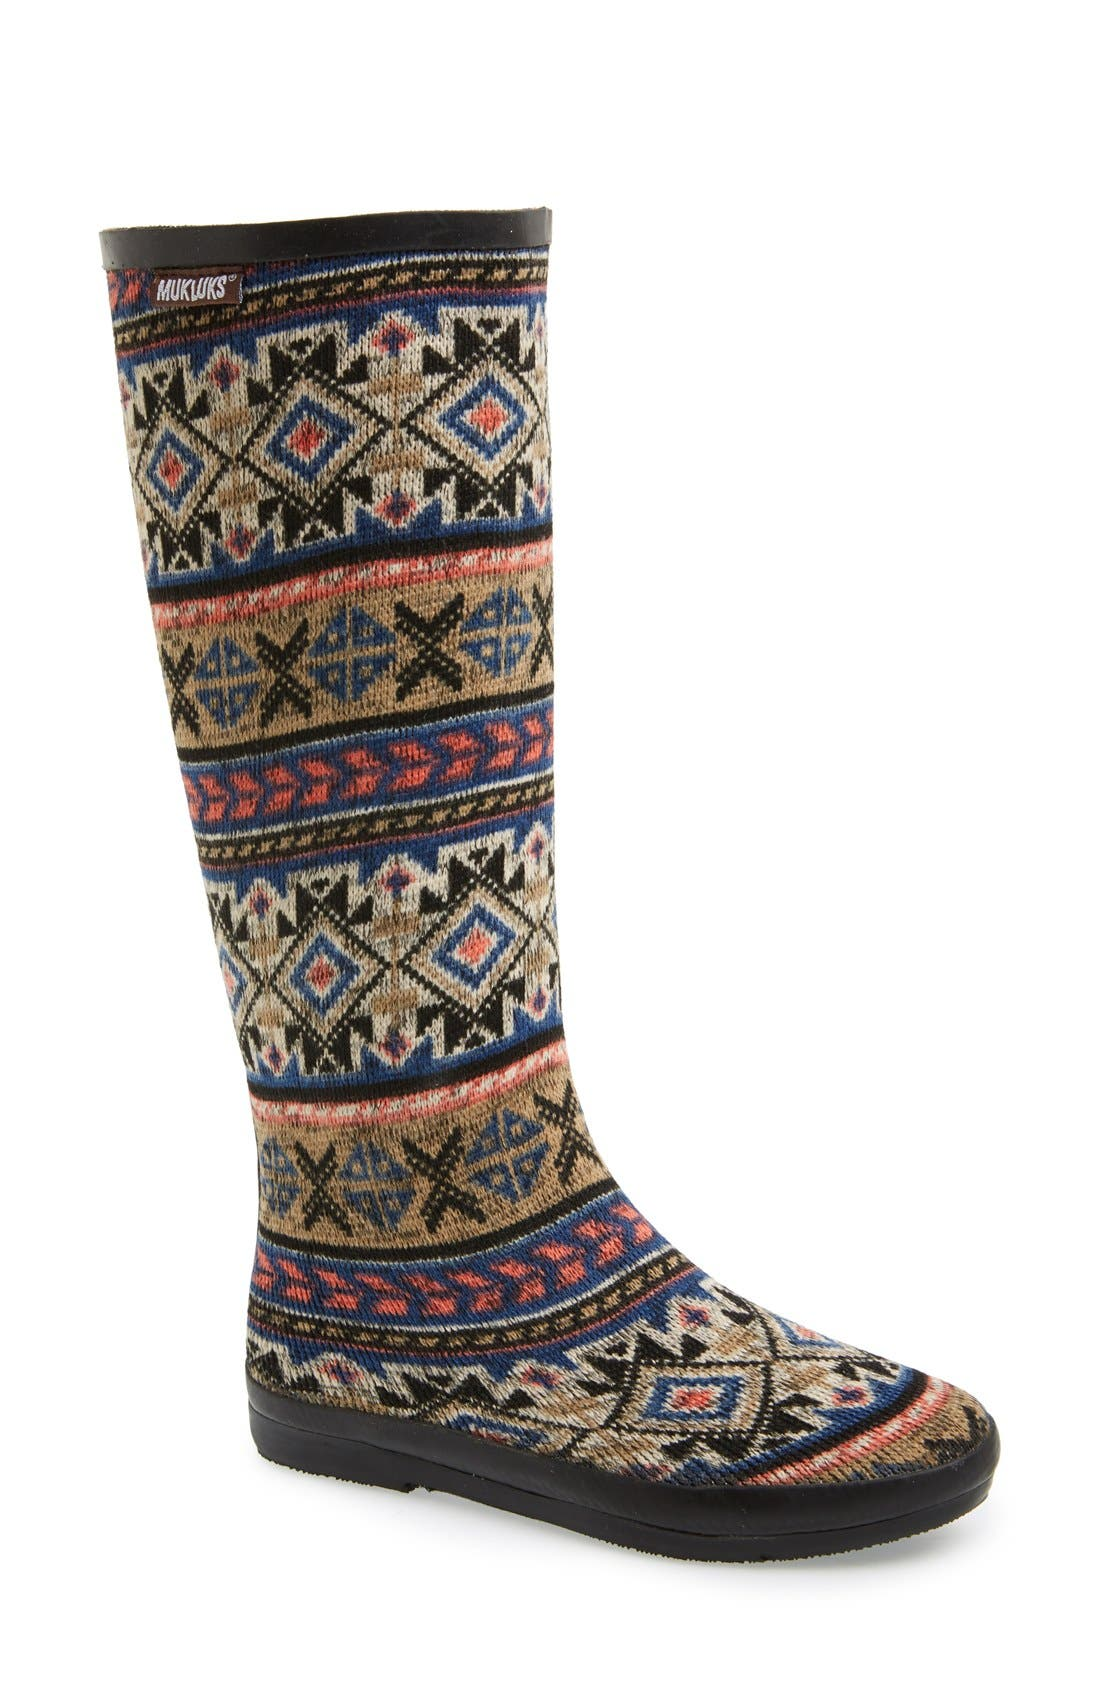 MUK LUKS 'Aubrie' Fair Isle Knit Rain Boot (Women) | Nordstrom